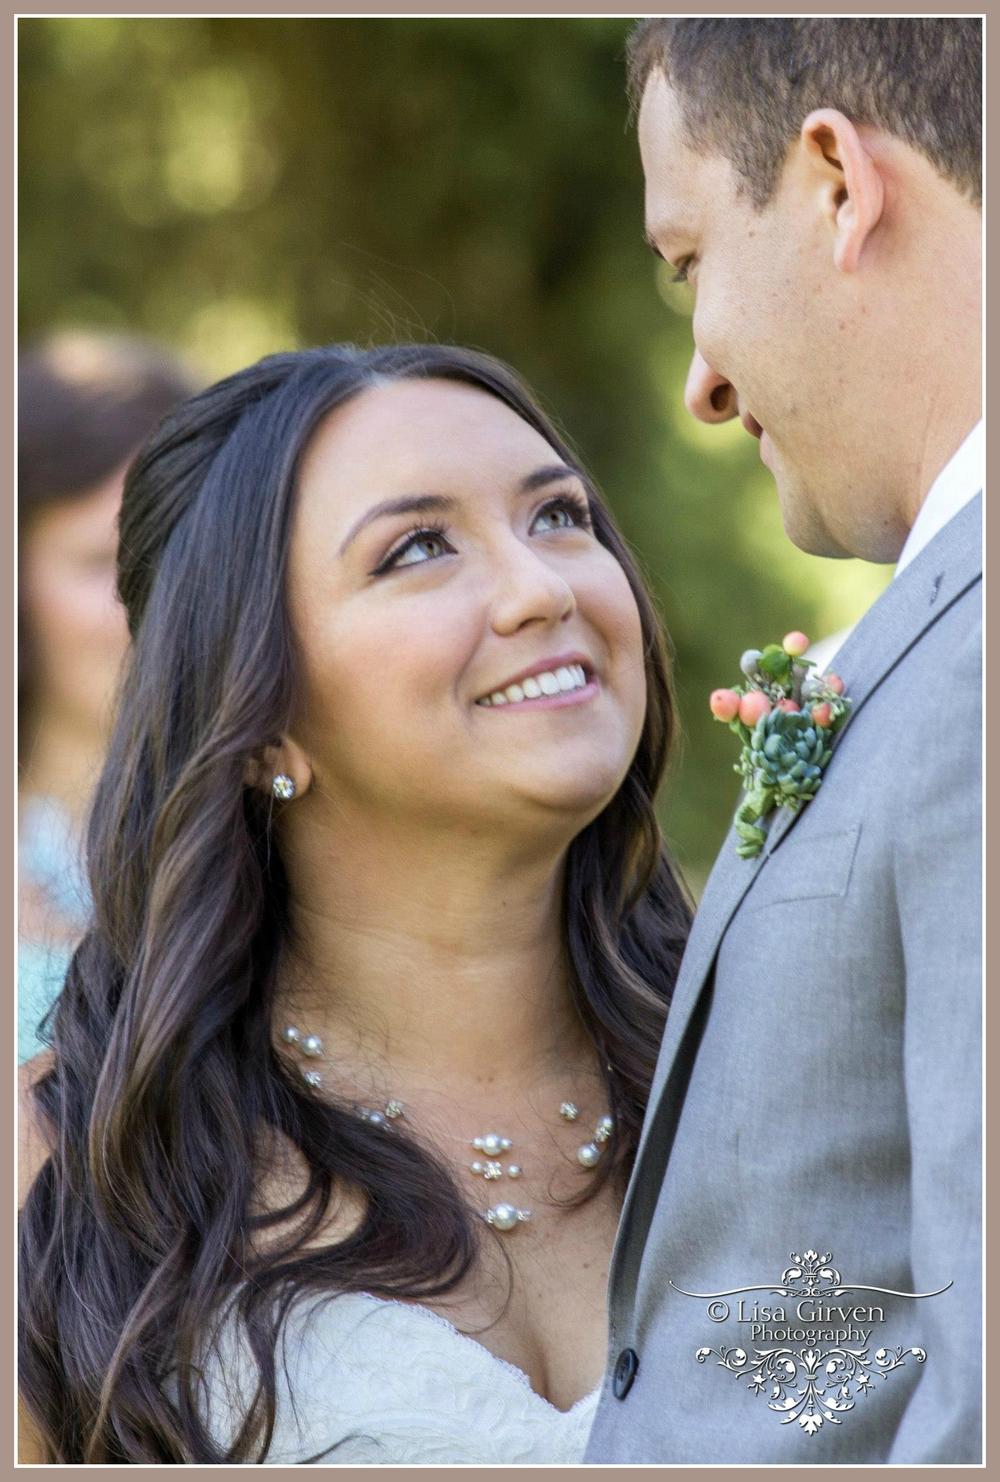 http://www.lisagirvenphotography.com/